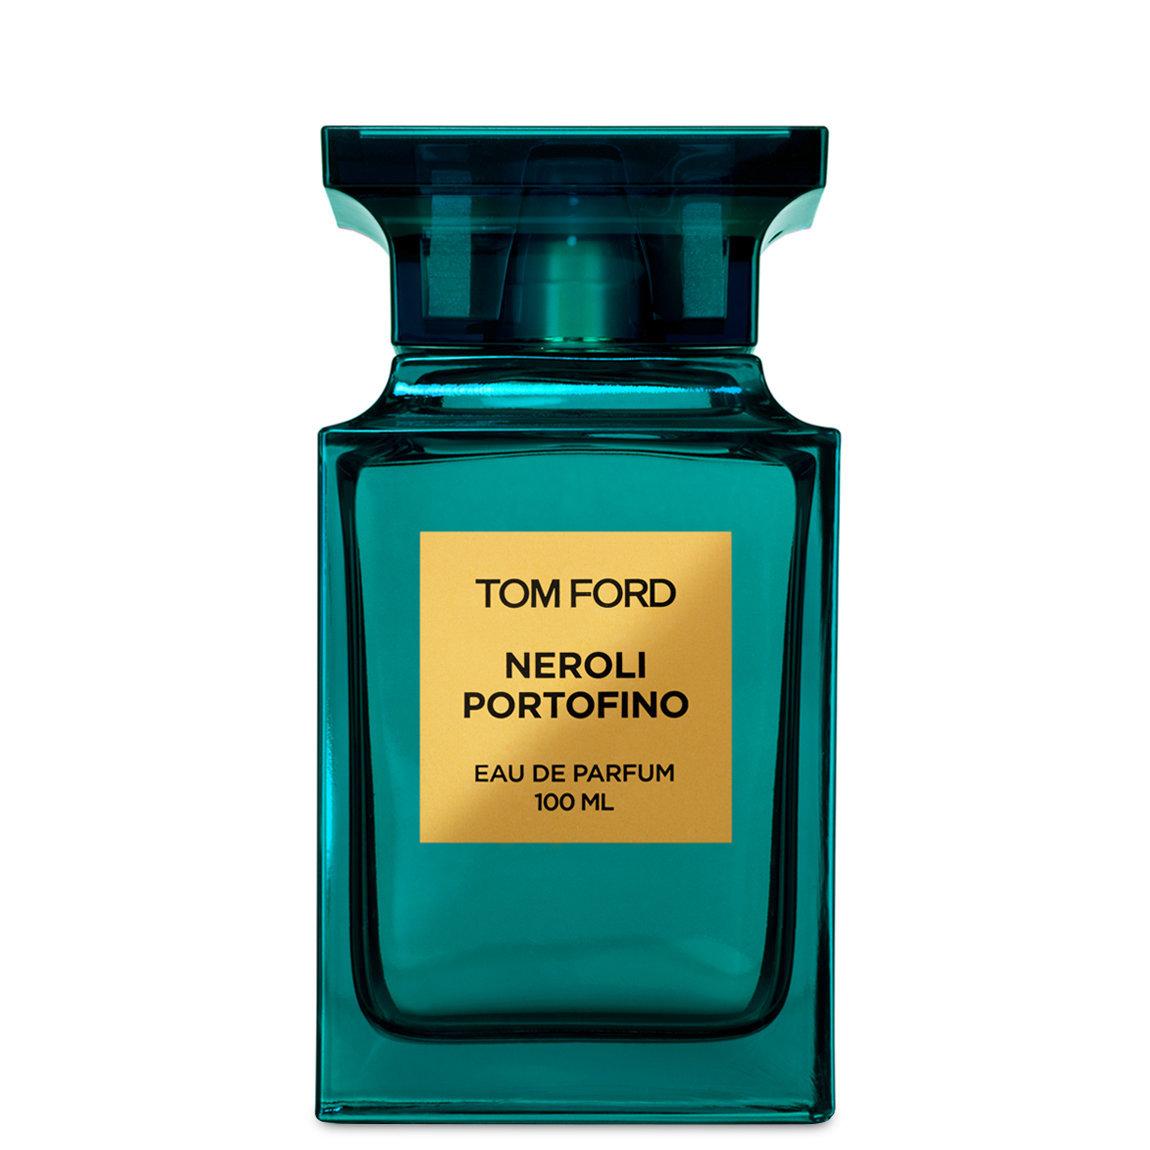 TOM FORD Neroli Portofino 100 ml alternative view 1 - product swatch.